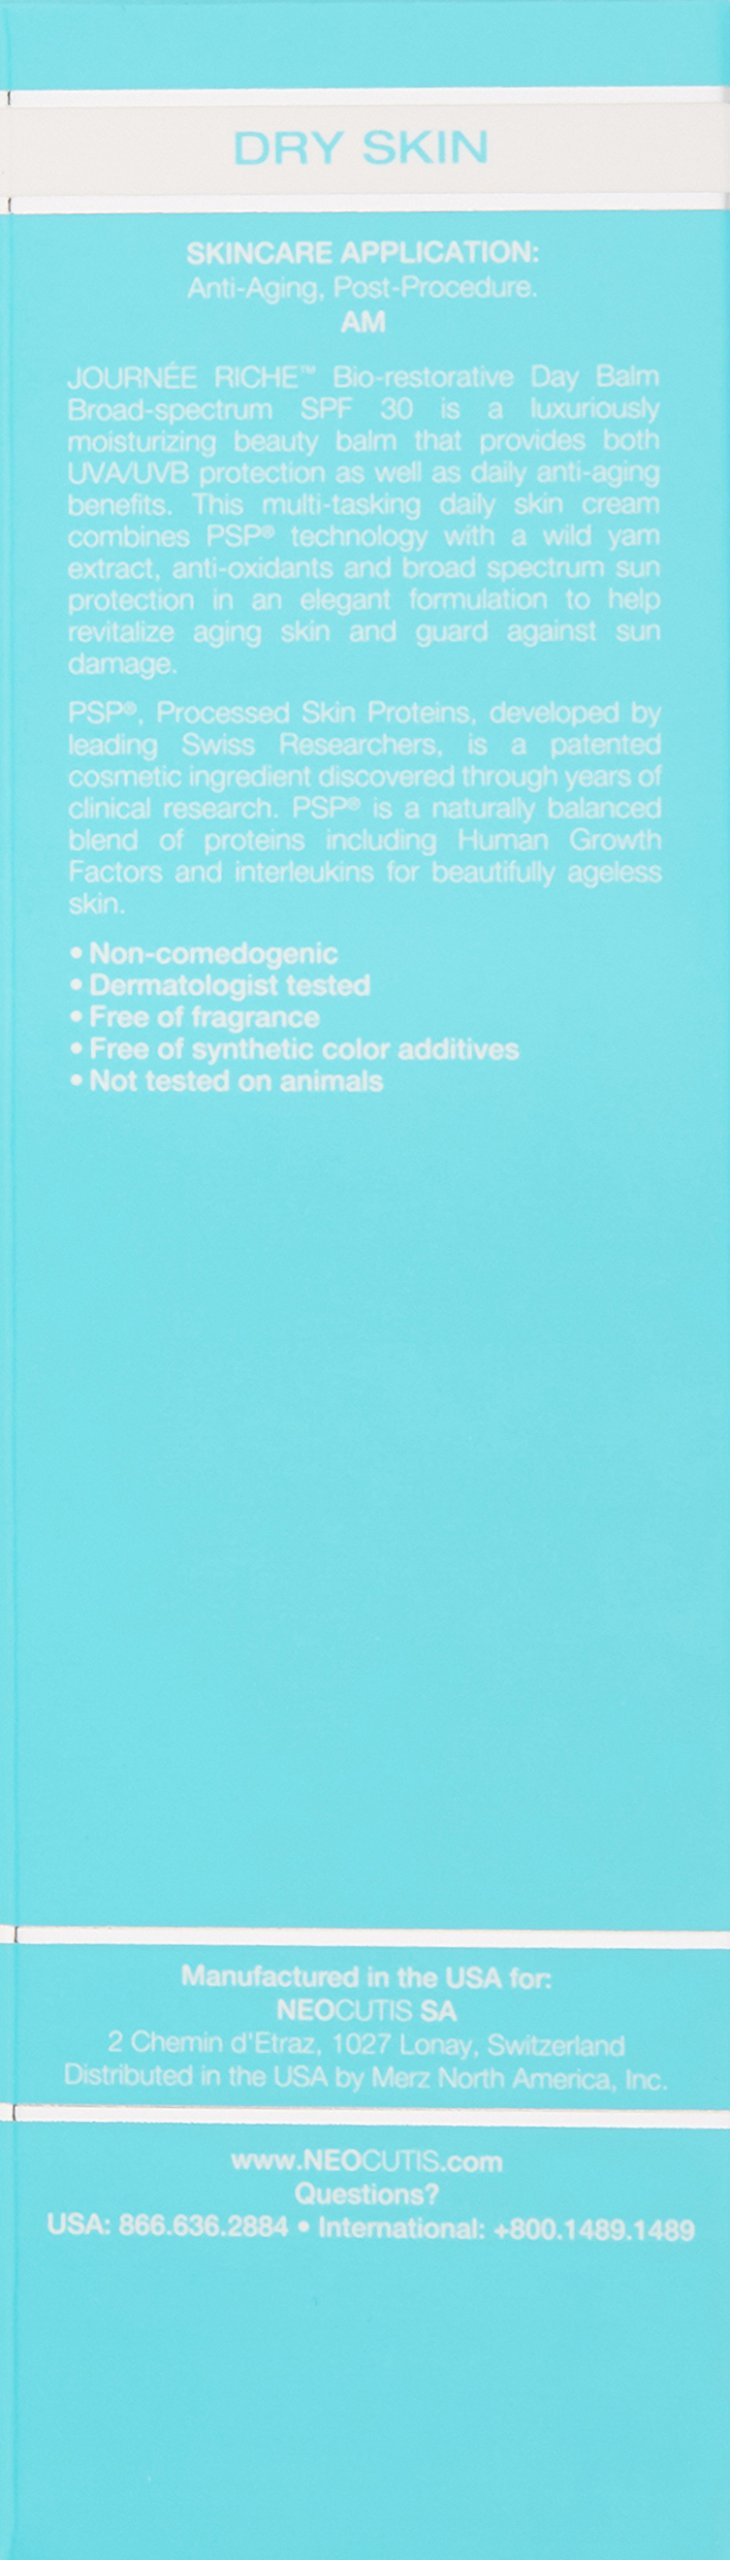 Neocutis Journee Riche Bio-Restorative Day Balm Broad-Spectrum Sunscreen SPF 30 1.69 oz by NEOCUTIS (Image #2)